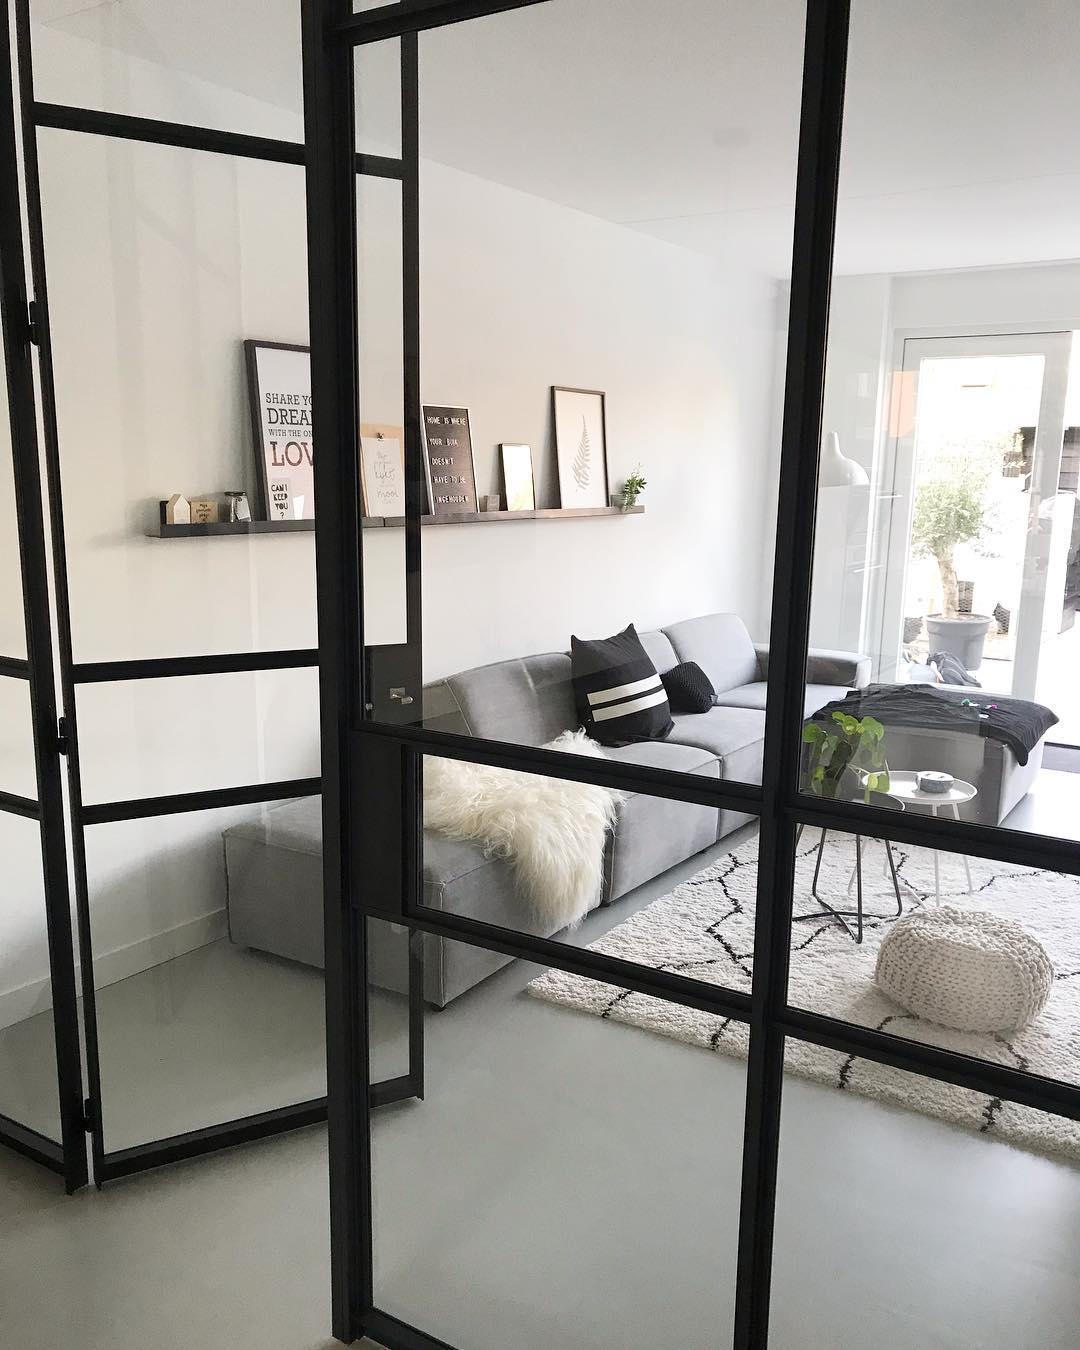 binnenkijken-bij-mensen-thuis-pronto-hoekbank-baricci (5)